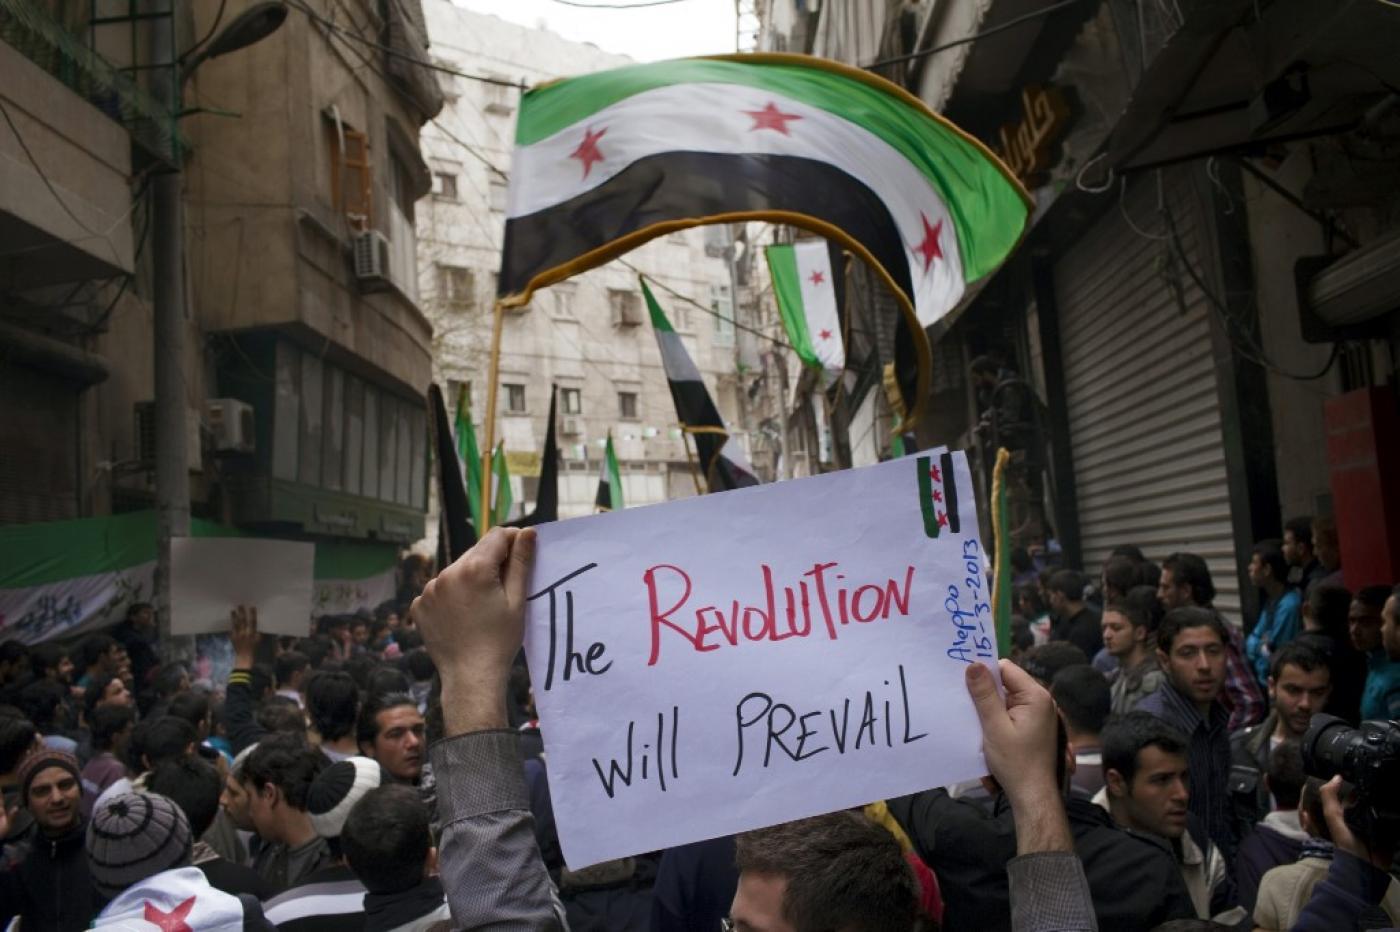 REVEALED: The British government's covert propaganda campaign in Syria